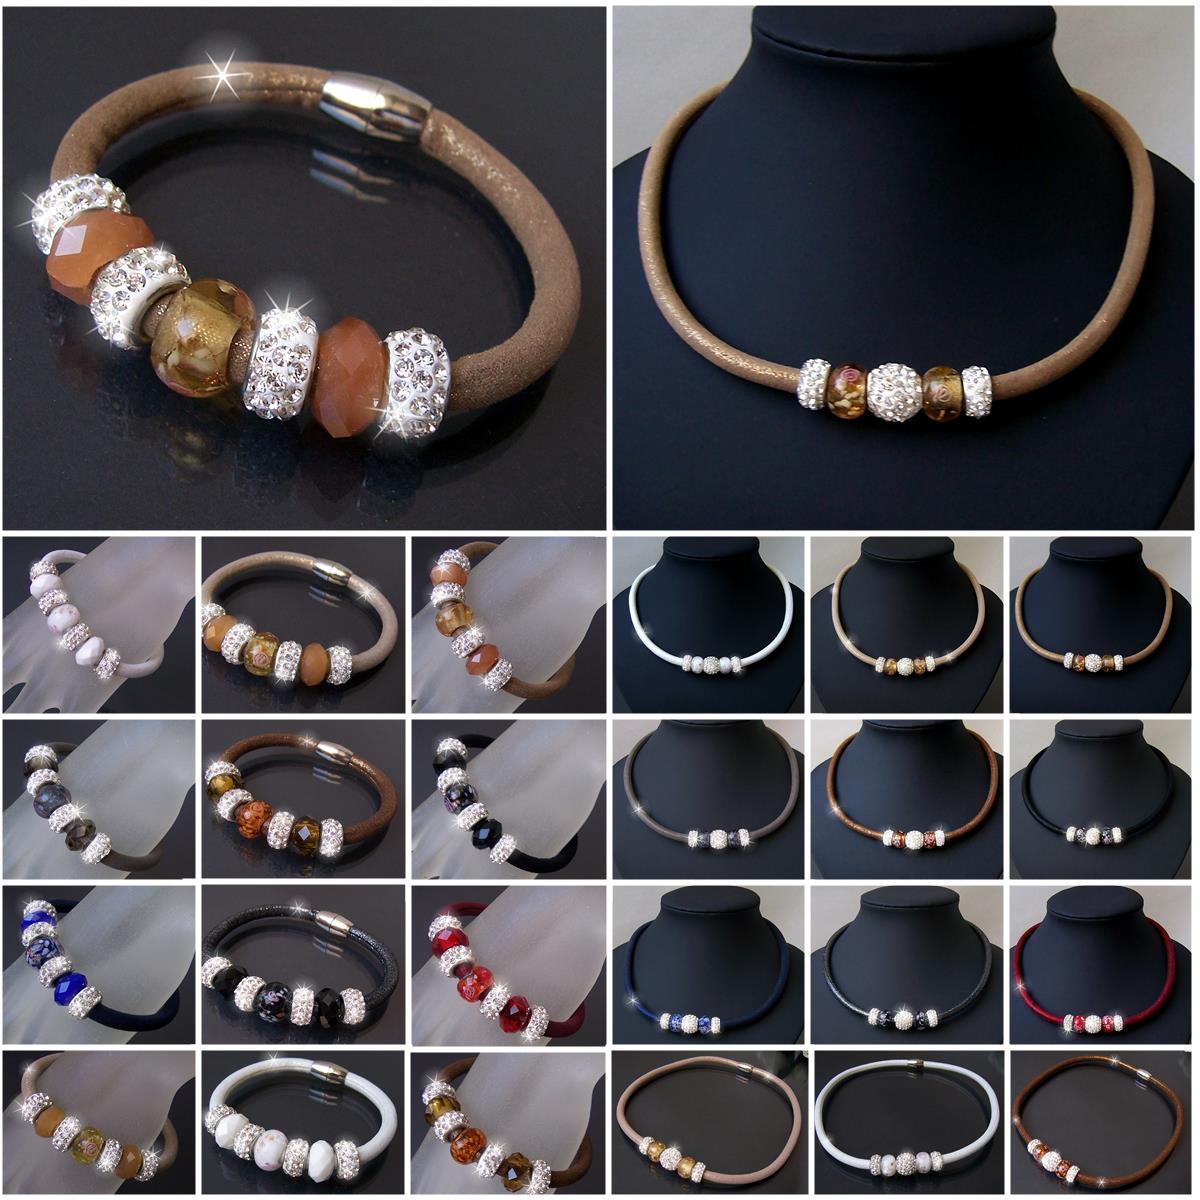 VS17# Collier Armband Schmuckset Satin Glitzerstoff Shamballa Perlen